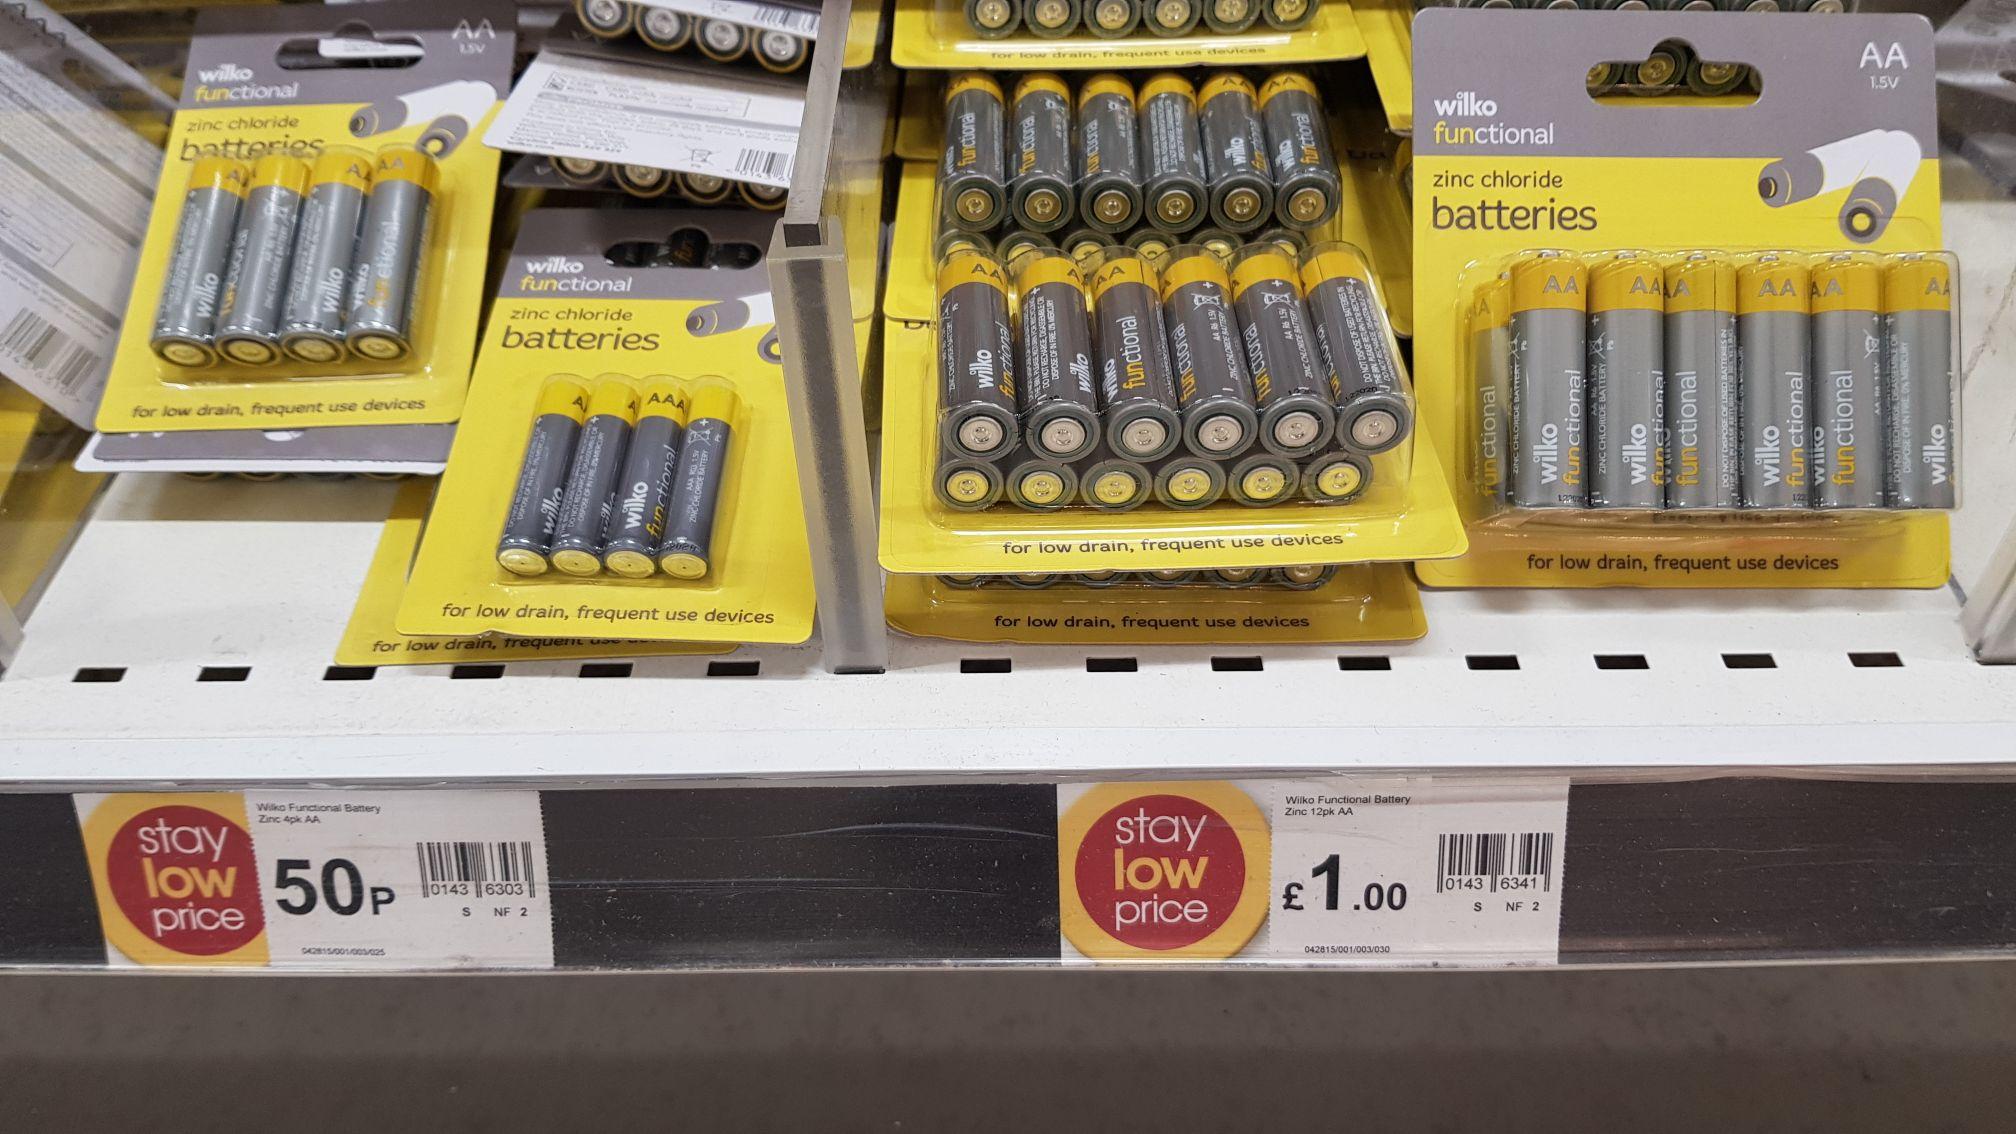 Wilko Functional Zinc Chloride Batteries AA 1.5V 12pk £1 @ Wilko Bradford